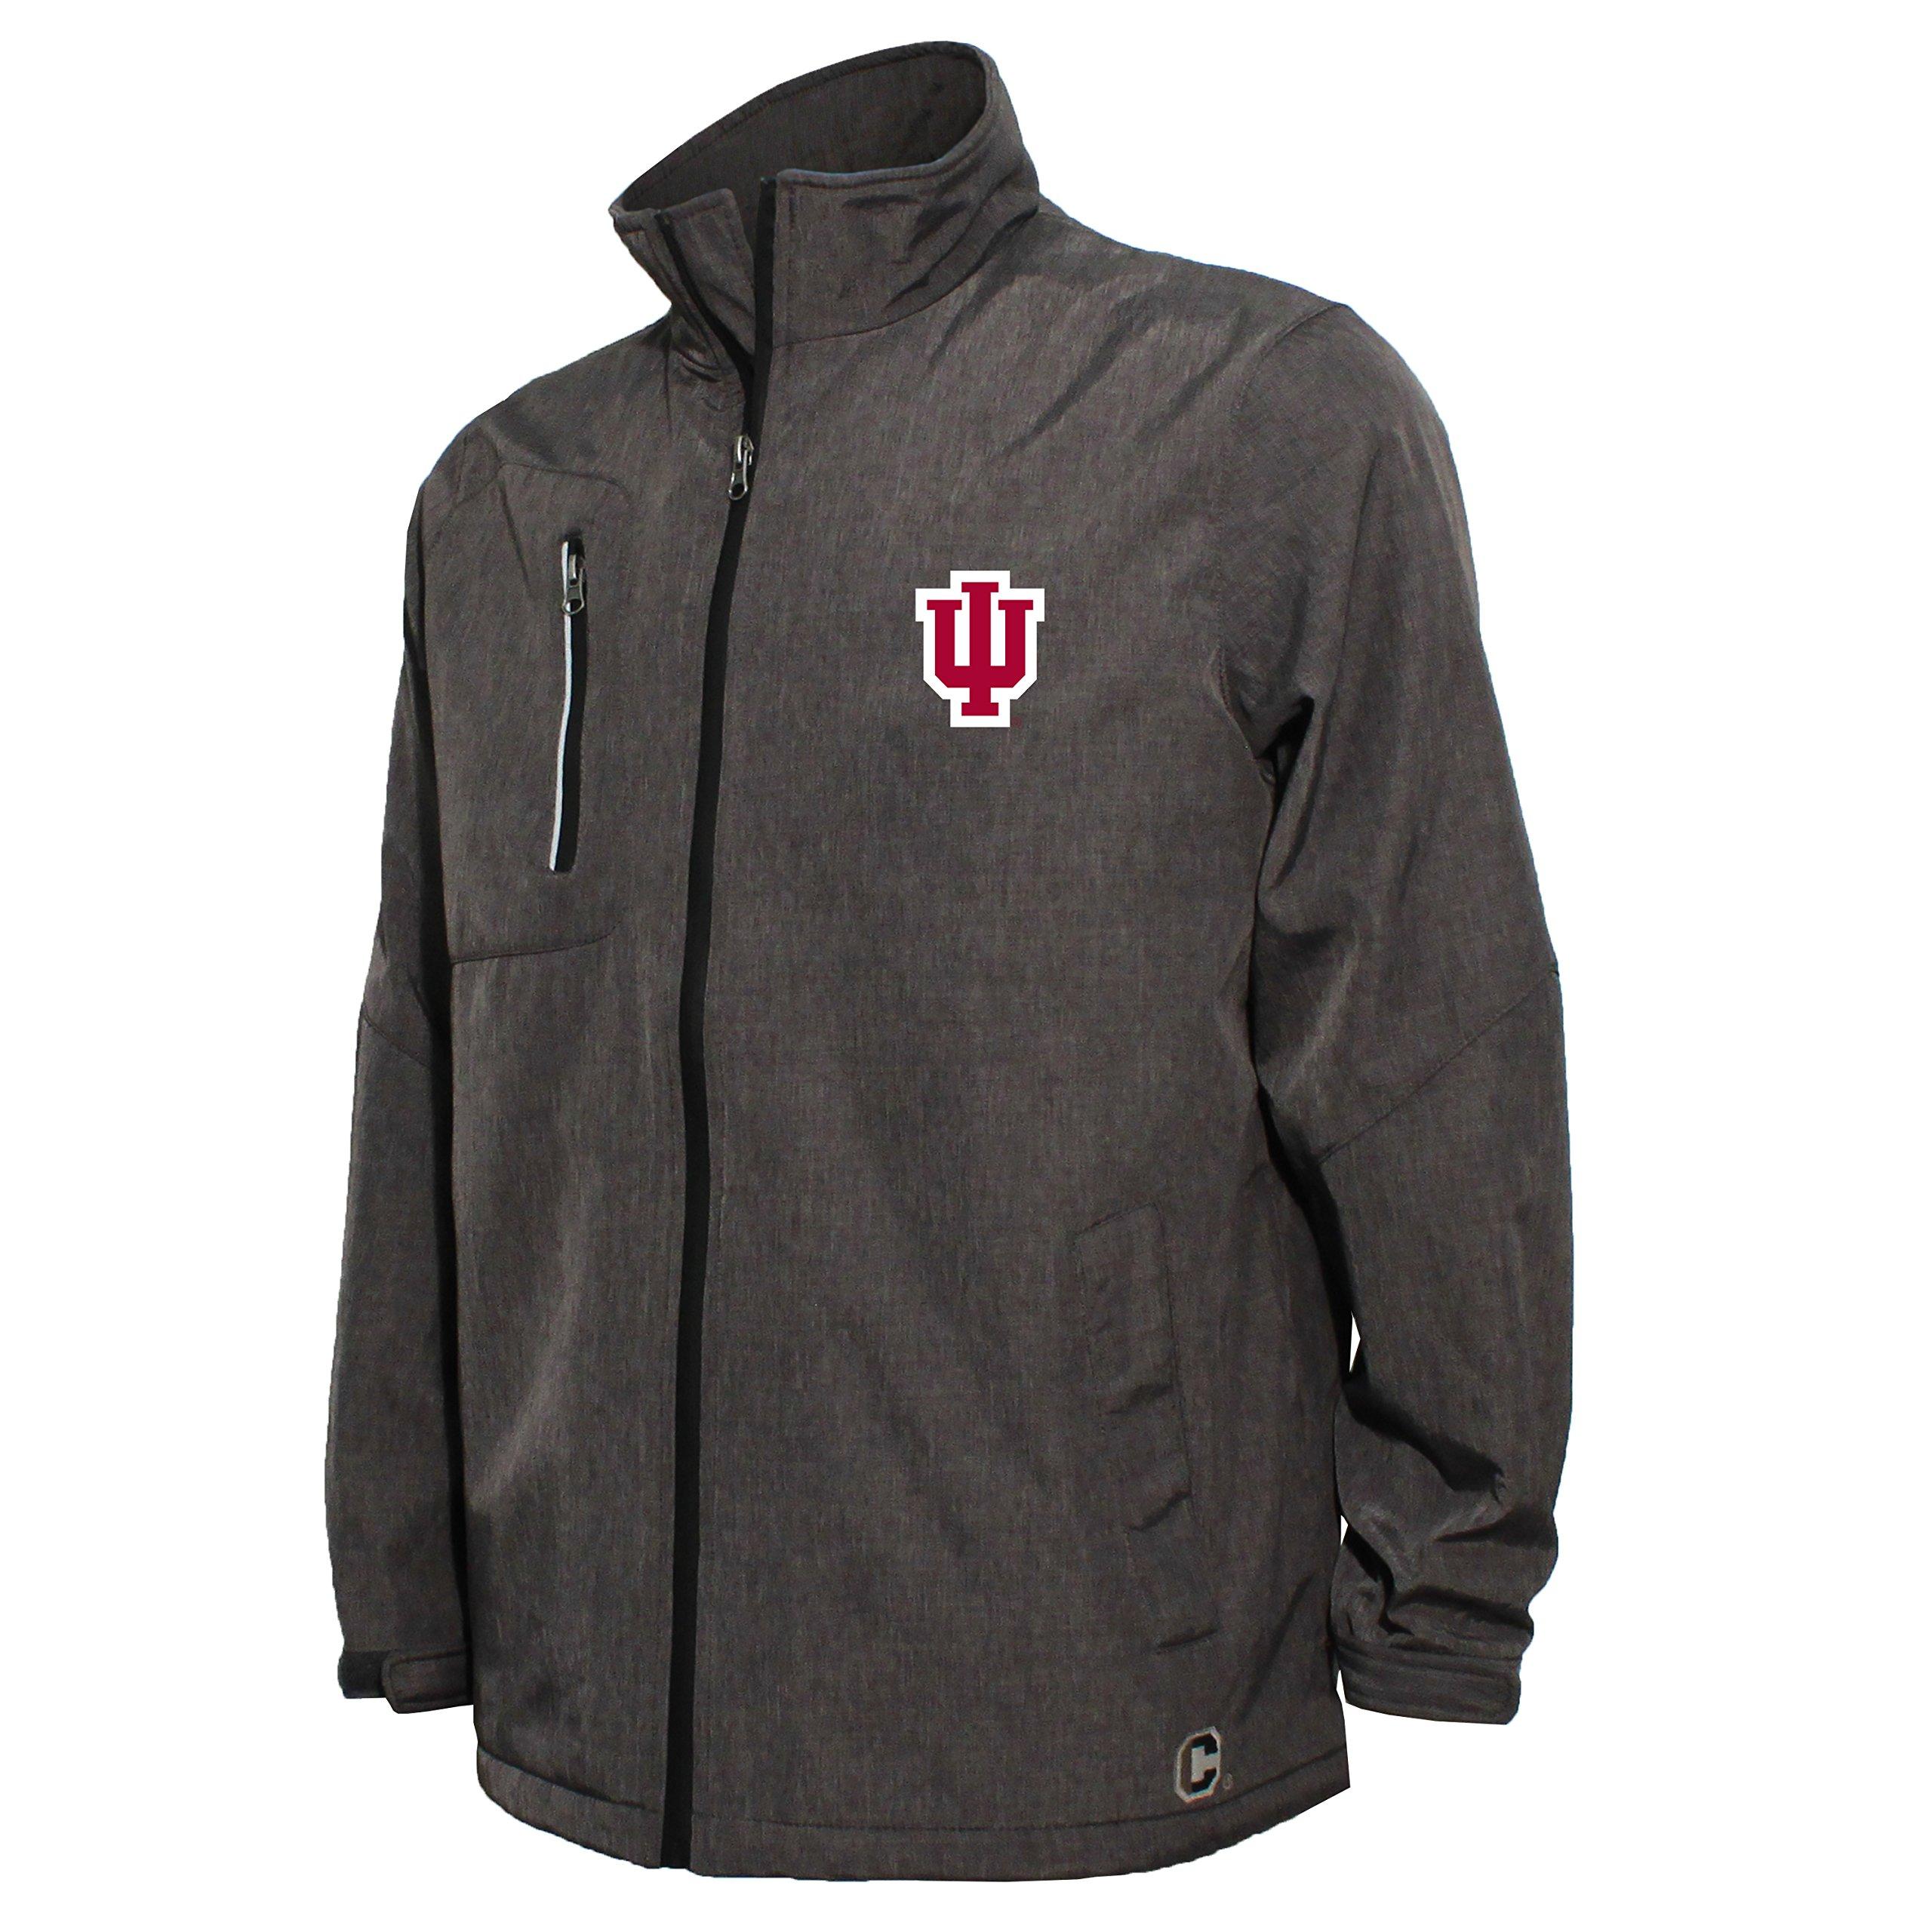 NCAA Indiana Hoosiers Men's Bonded Stand Up Collar Stadium Jacket, Small, Dark Gray